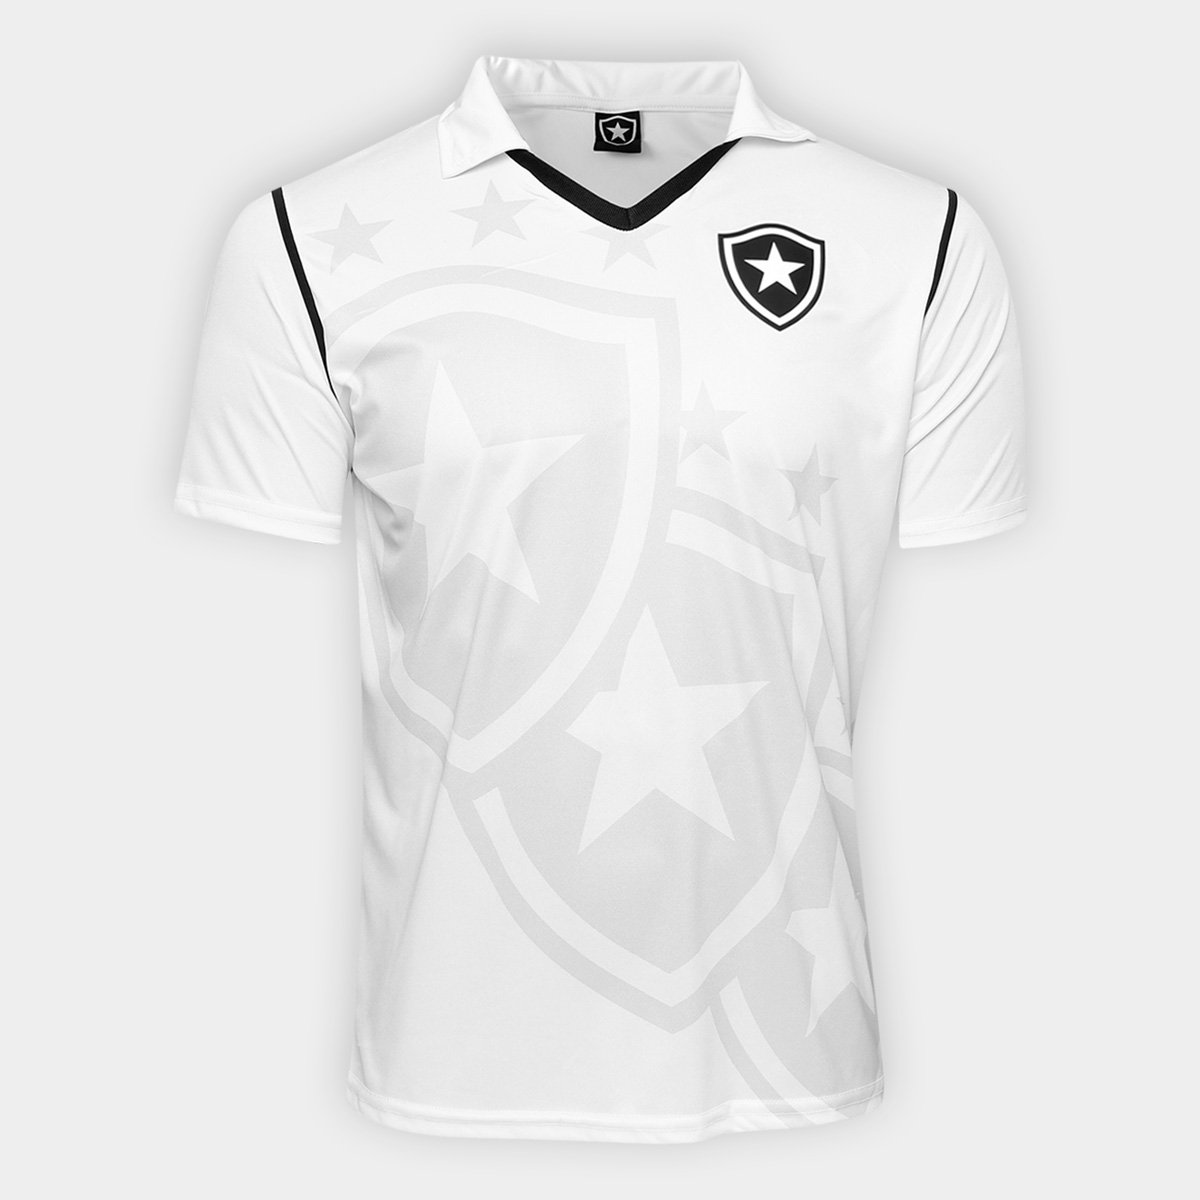 2de5399ad5 Camisa Botafogo Escudo c/ Estrela Masculina